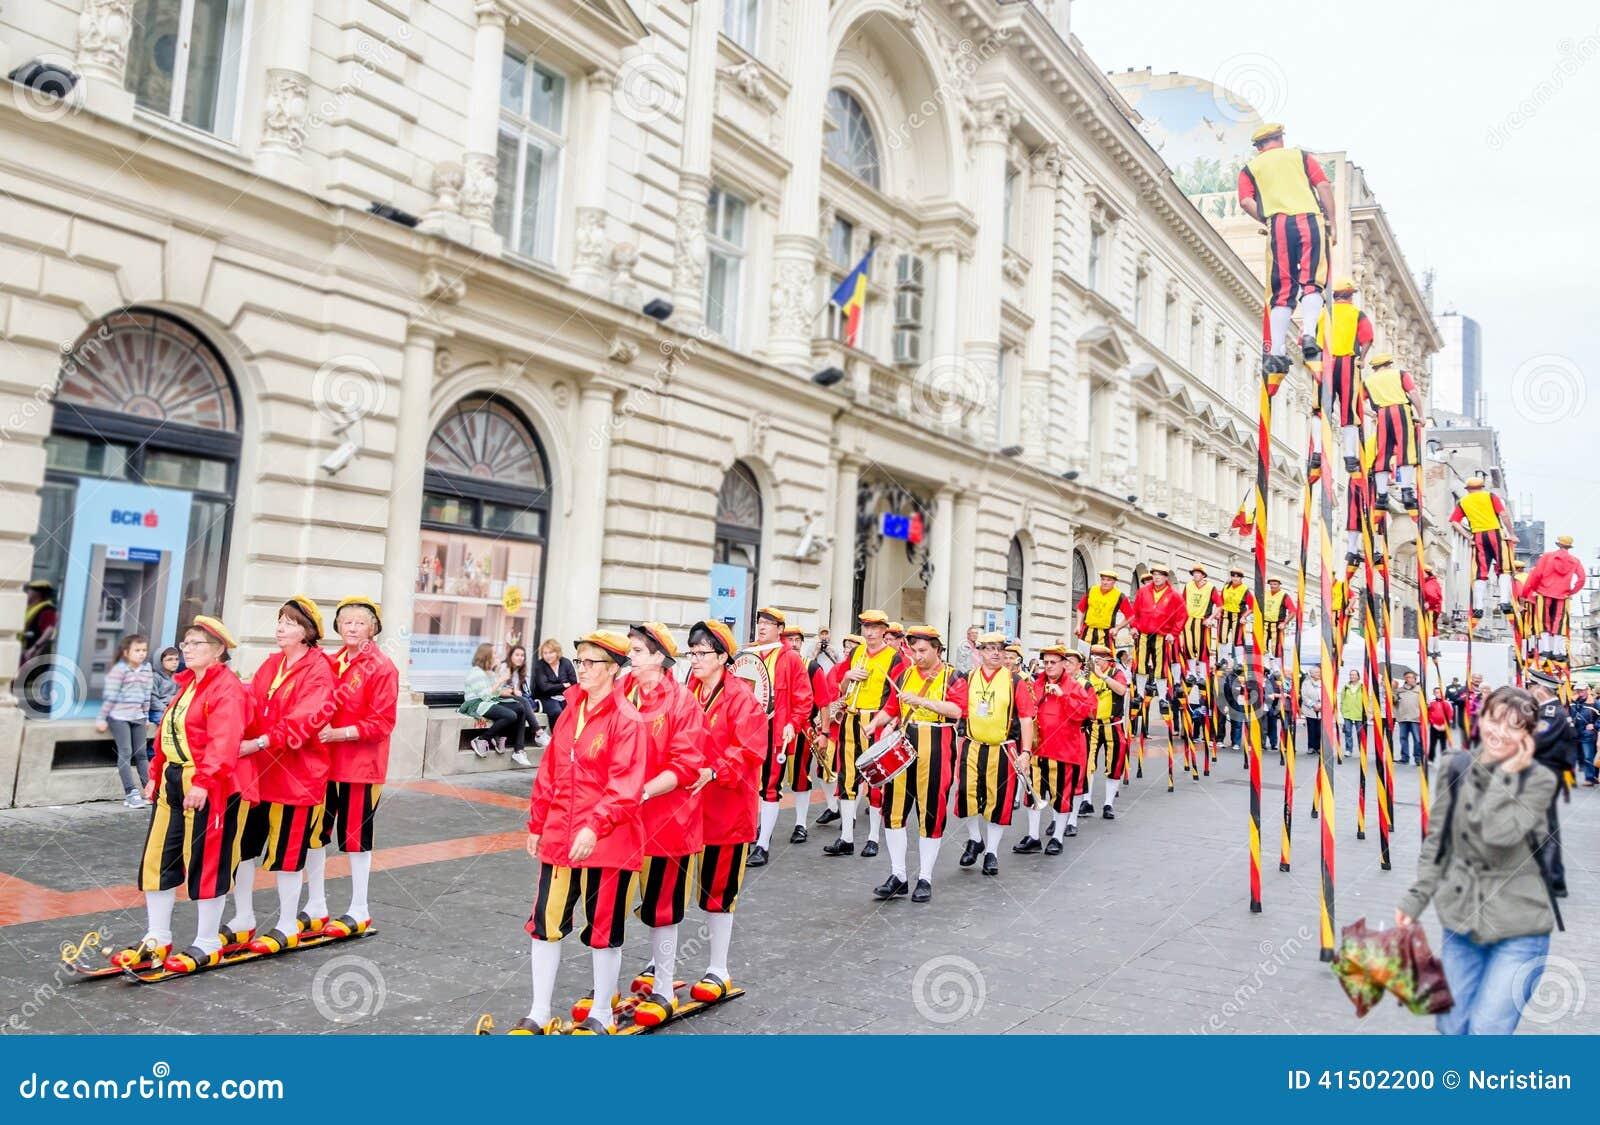 Steltlopers Merchtem Belgium, Stiltwalkers